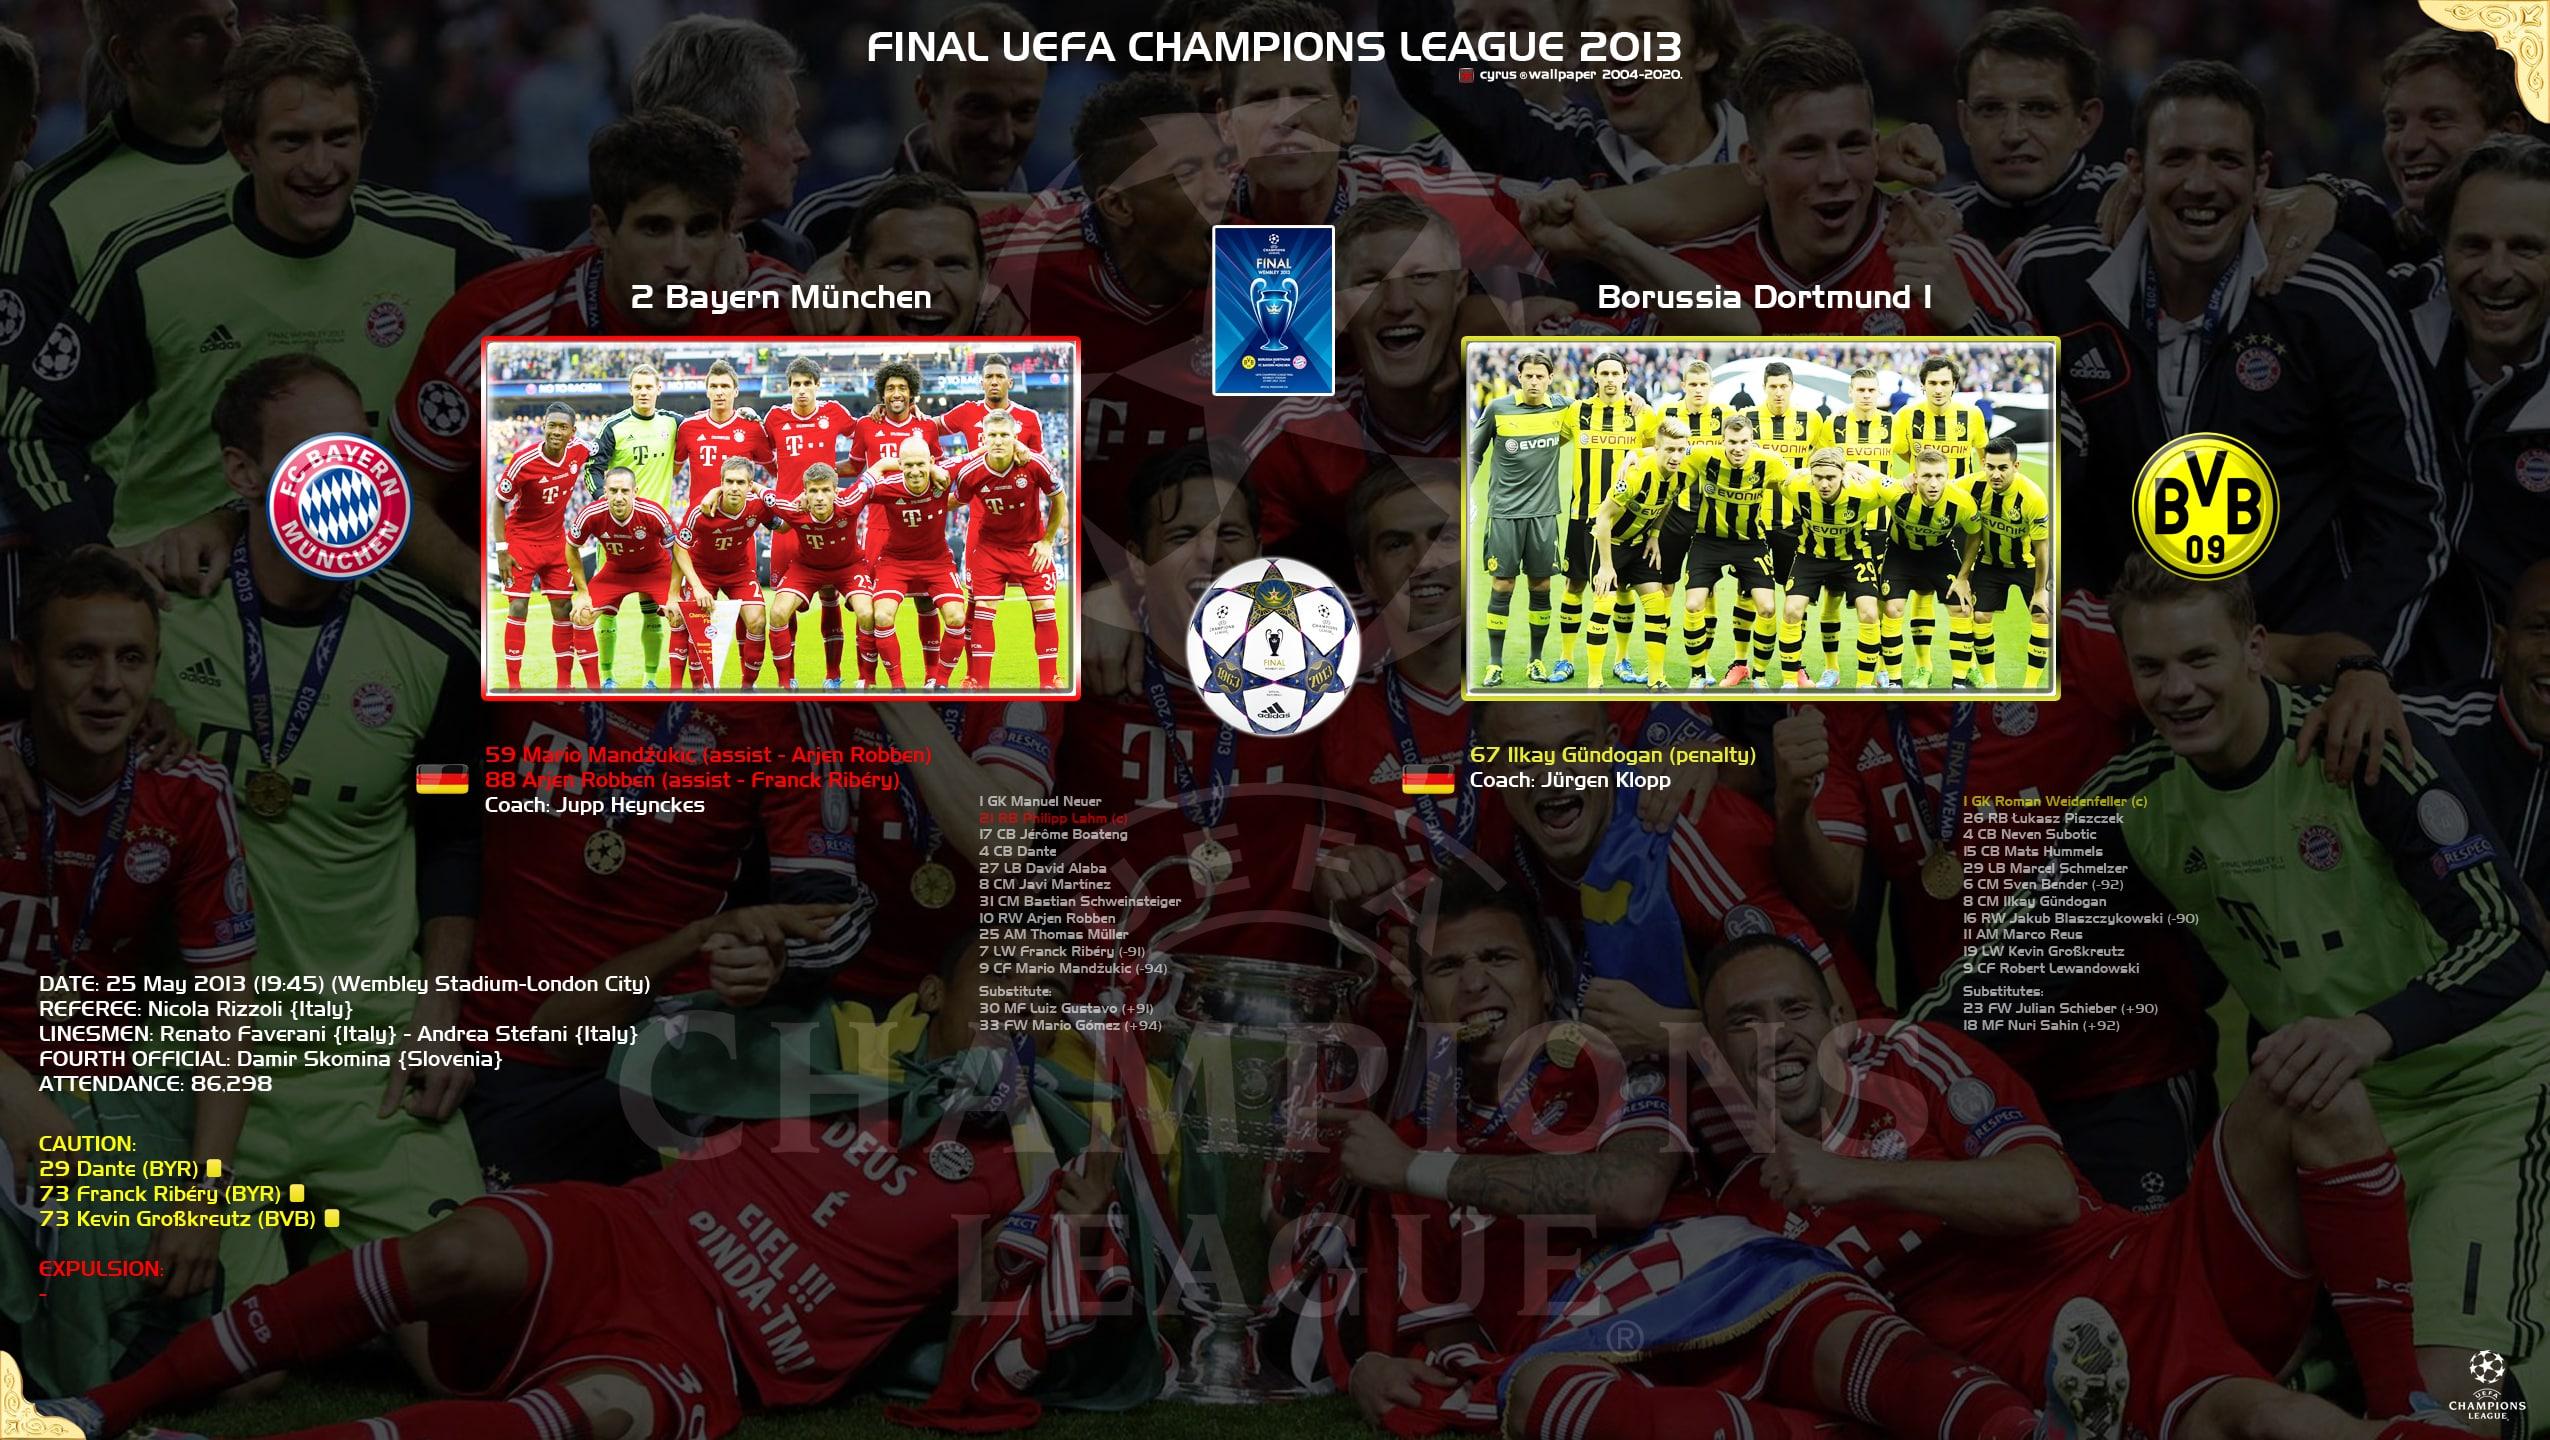 والپیپر فینال لیگ قهرمانان اروپا 2013